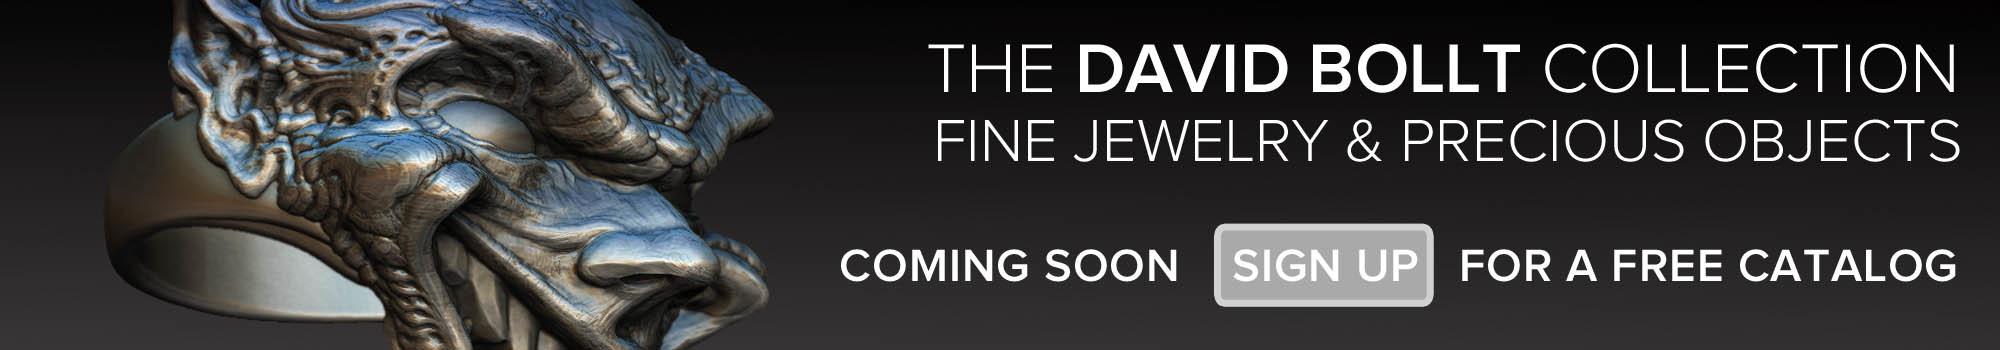 <div class='title'>           David Bollt Jewelry Catalog         </div>                 <div class='description'>           David Bollt Jewelry Catalog         </div>